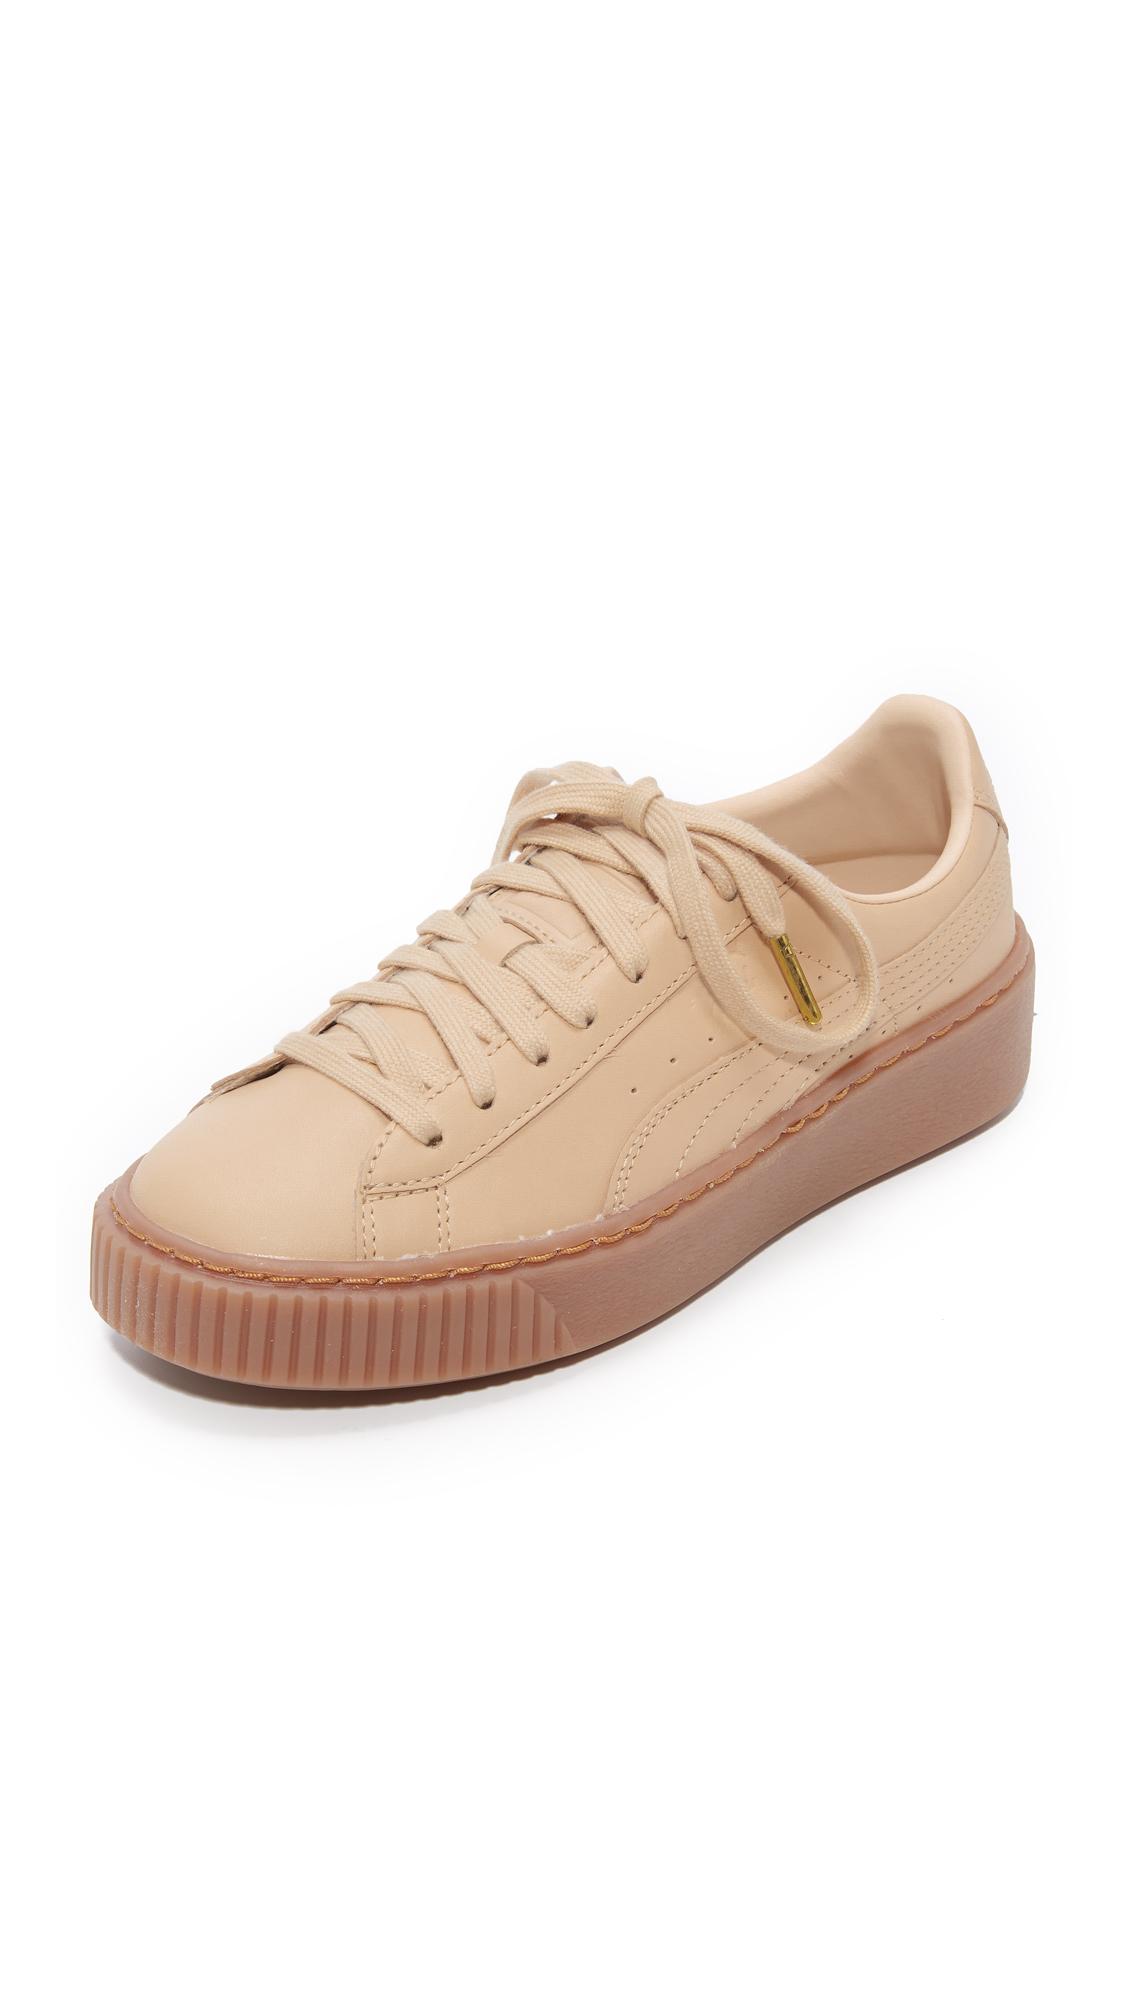 PUMA x NATUREL Platform Sneakers - Natural